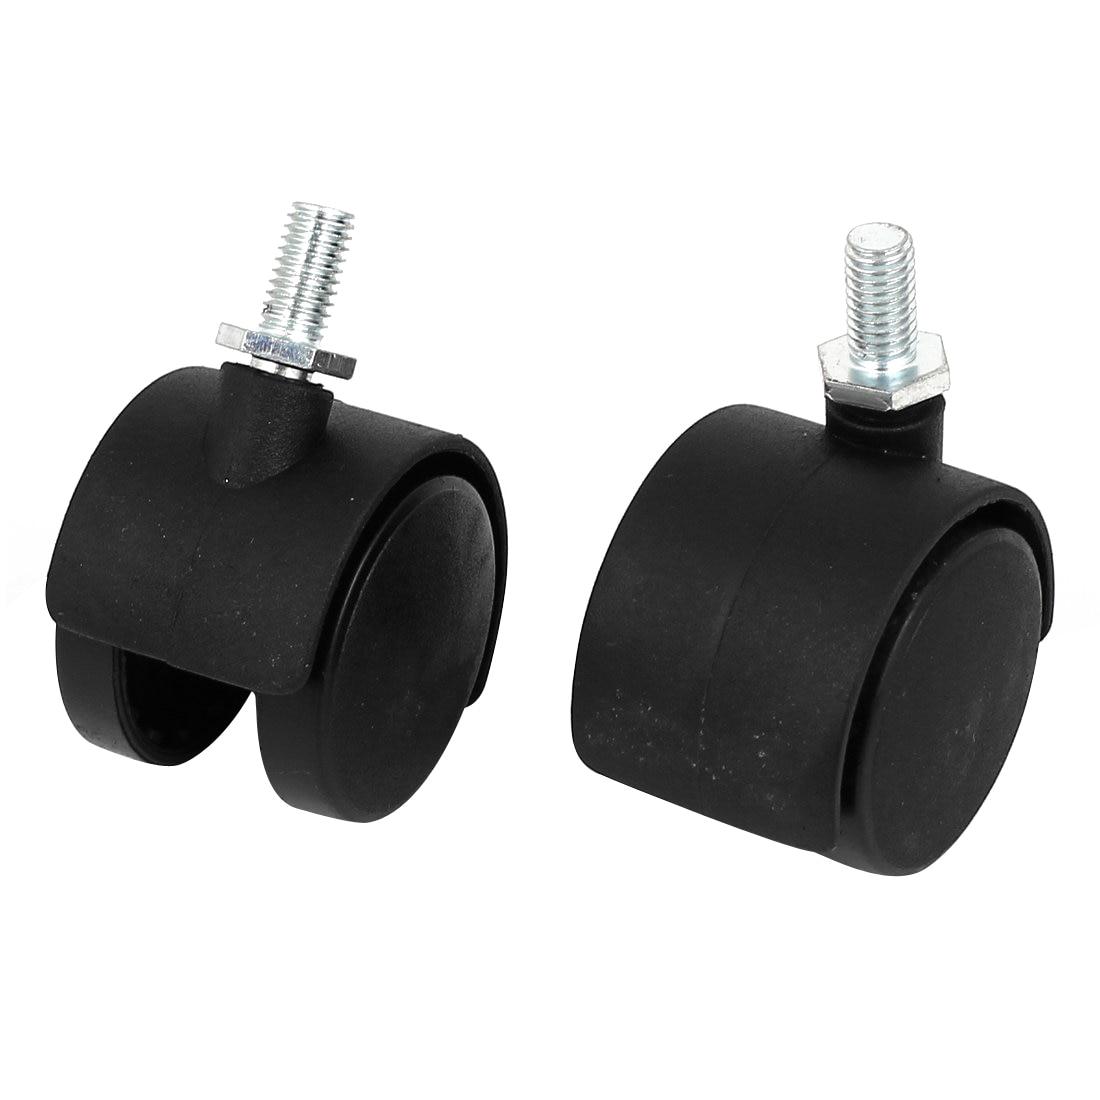 цена на 8mm Threaded Stem 1.5 Inch Dia Wheel Chair Swivel Caster 2 Pcs Black